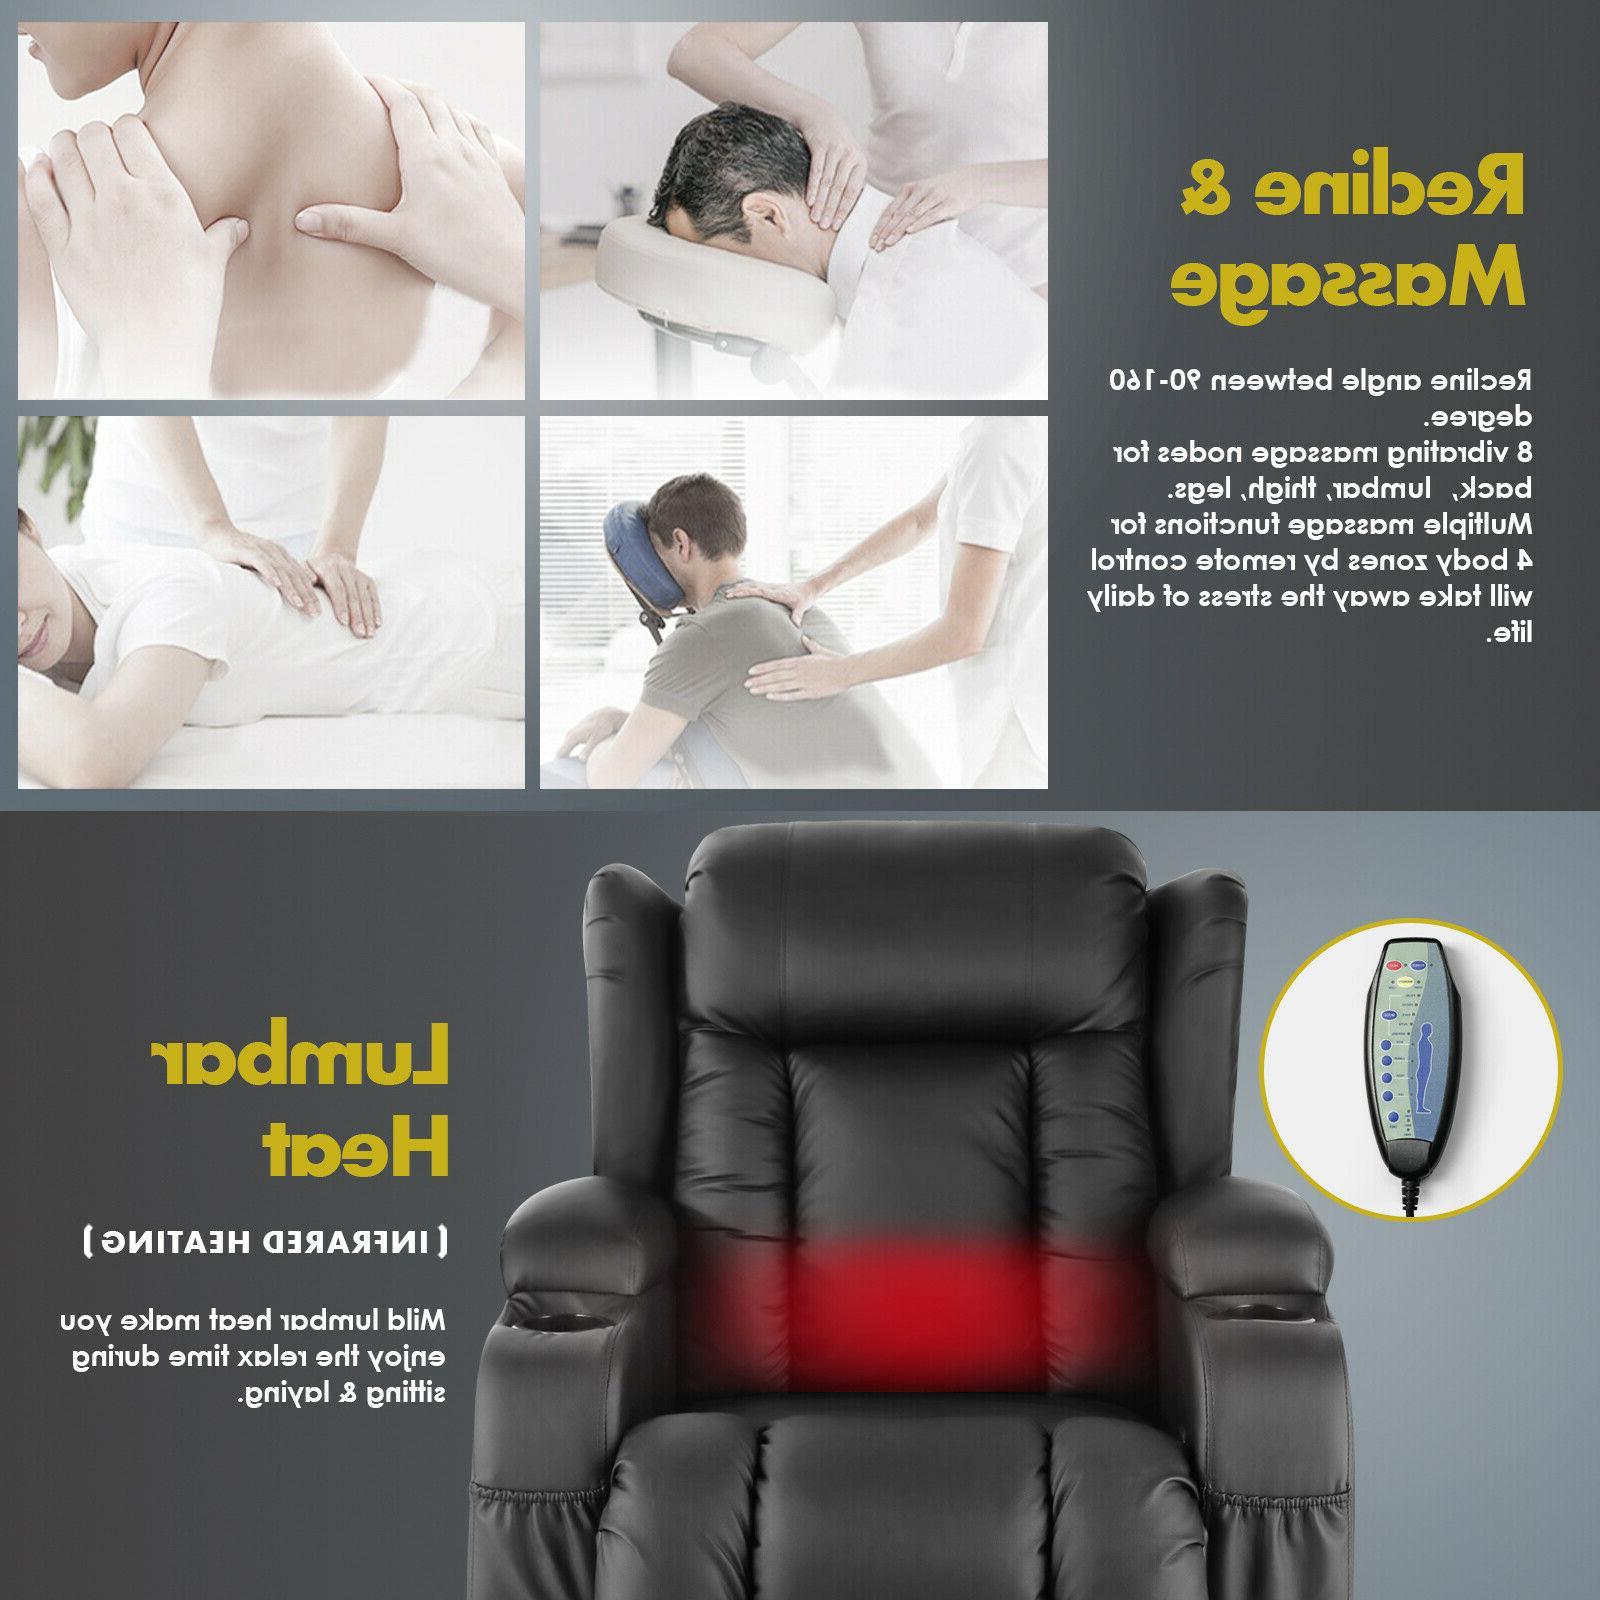 Oversize Massage Recliner Vibrate w/Control